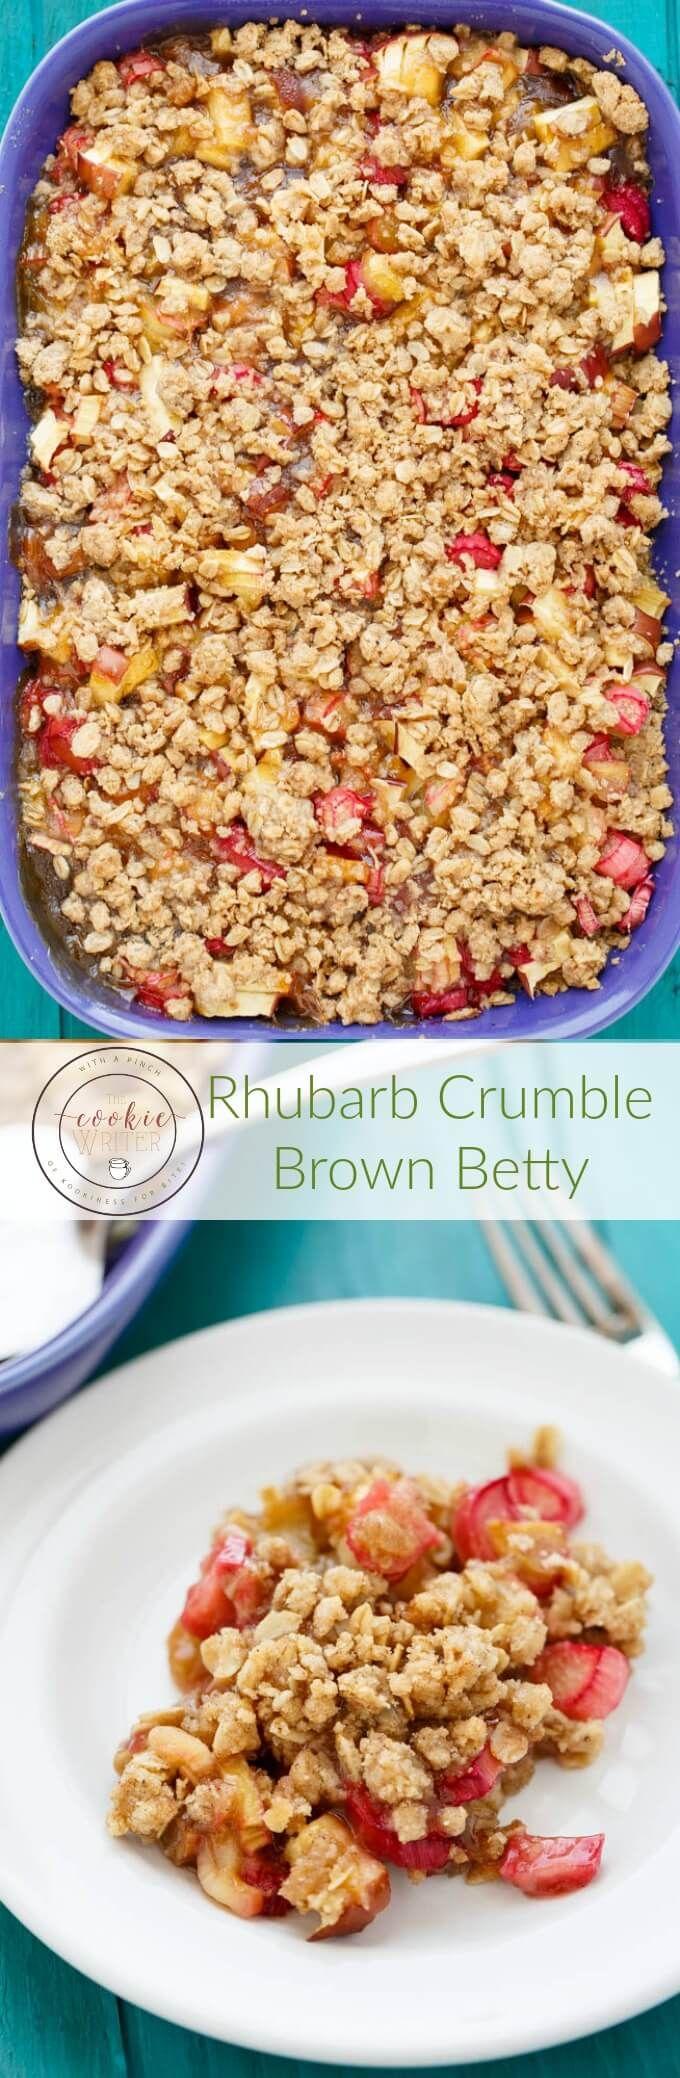 Rhubarb Crumble Brown Betty | http://thecookiewriter.com | @thecookiewriter | #dessert